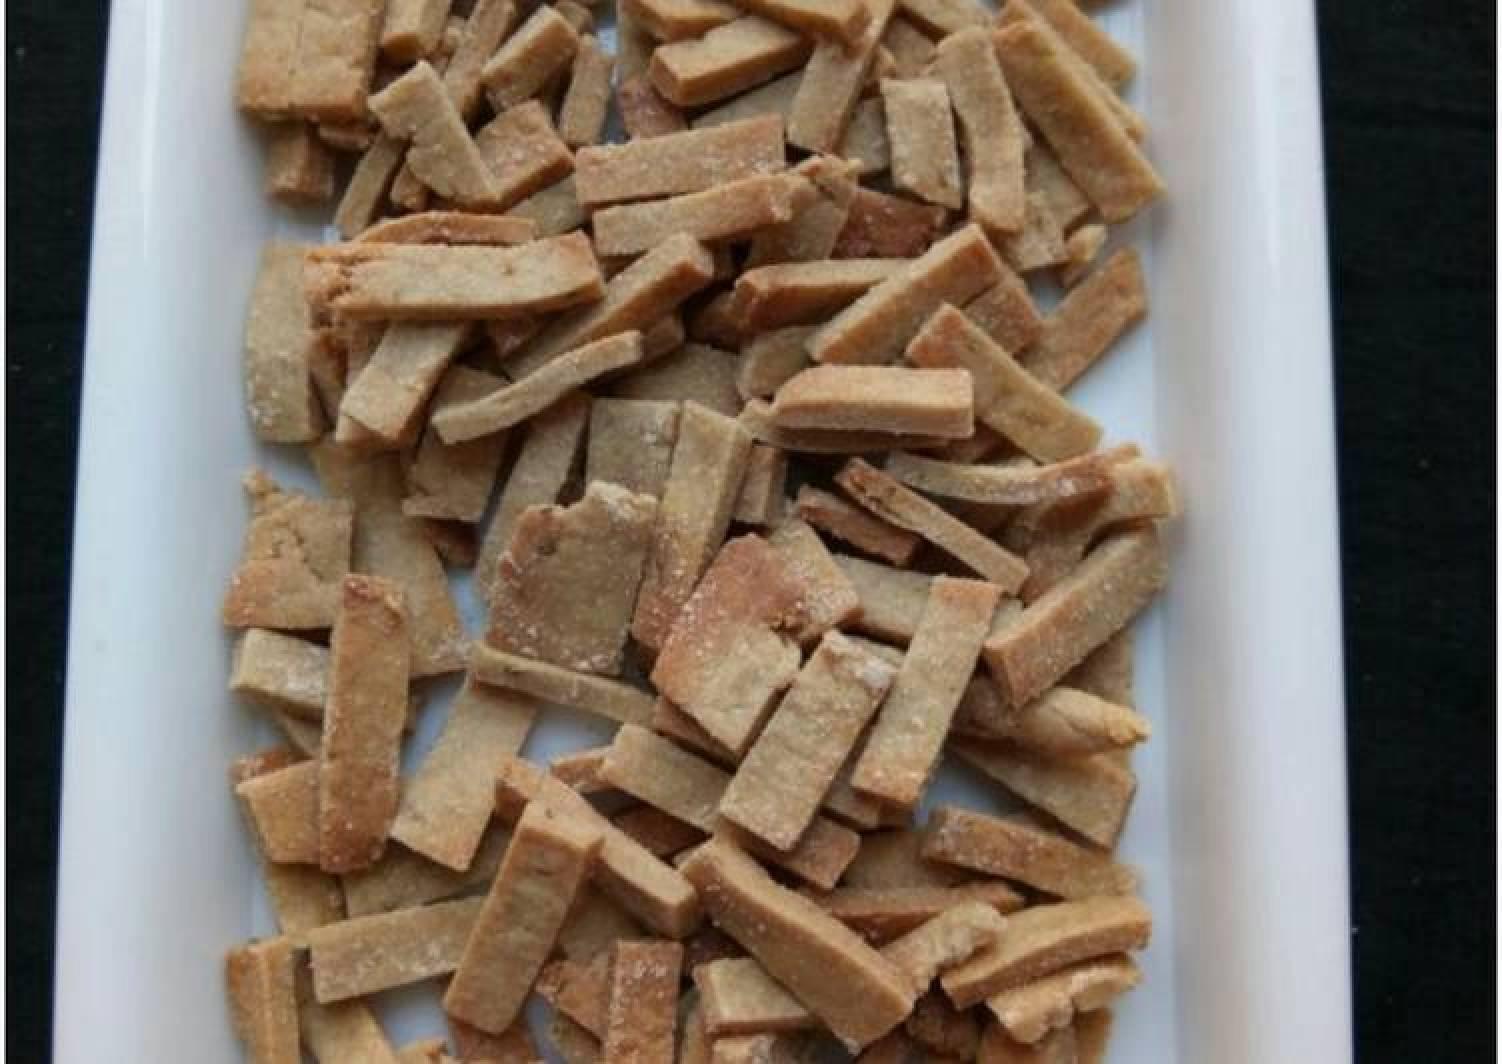 Baked wheat flour namakpare